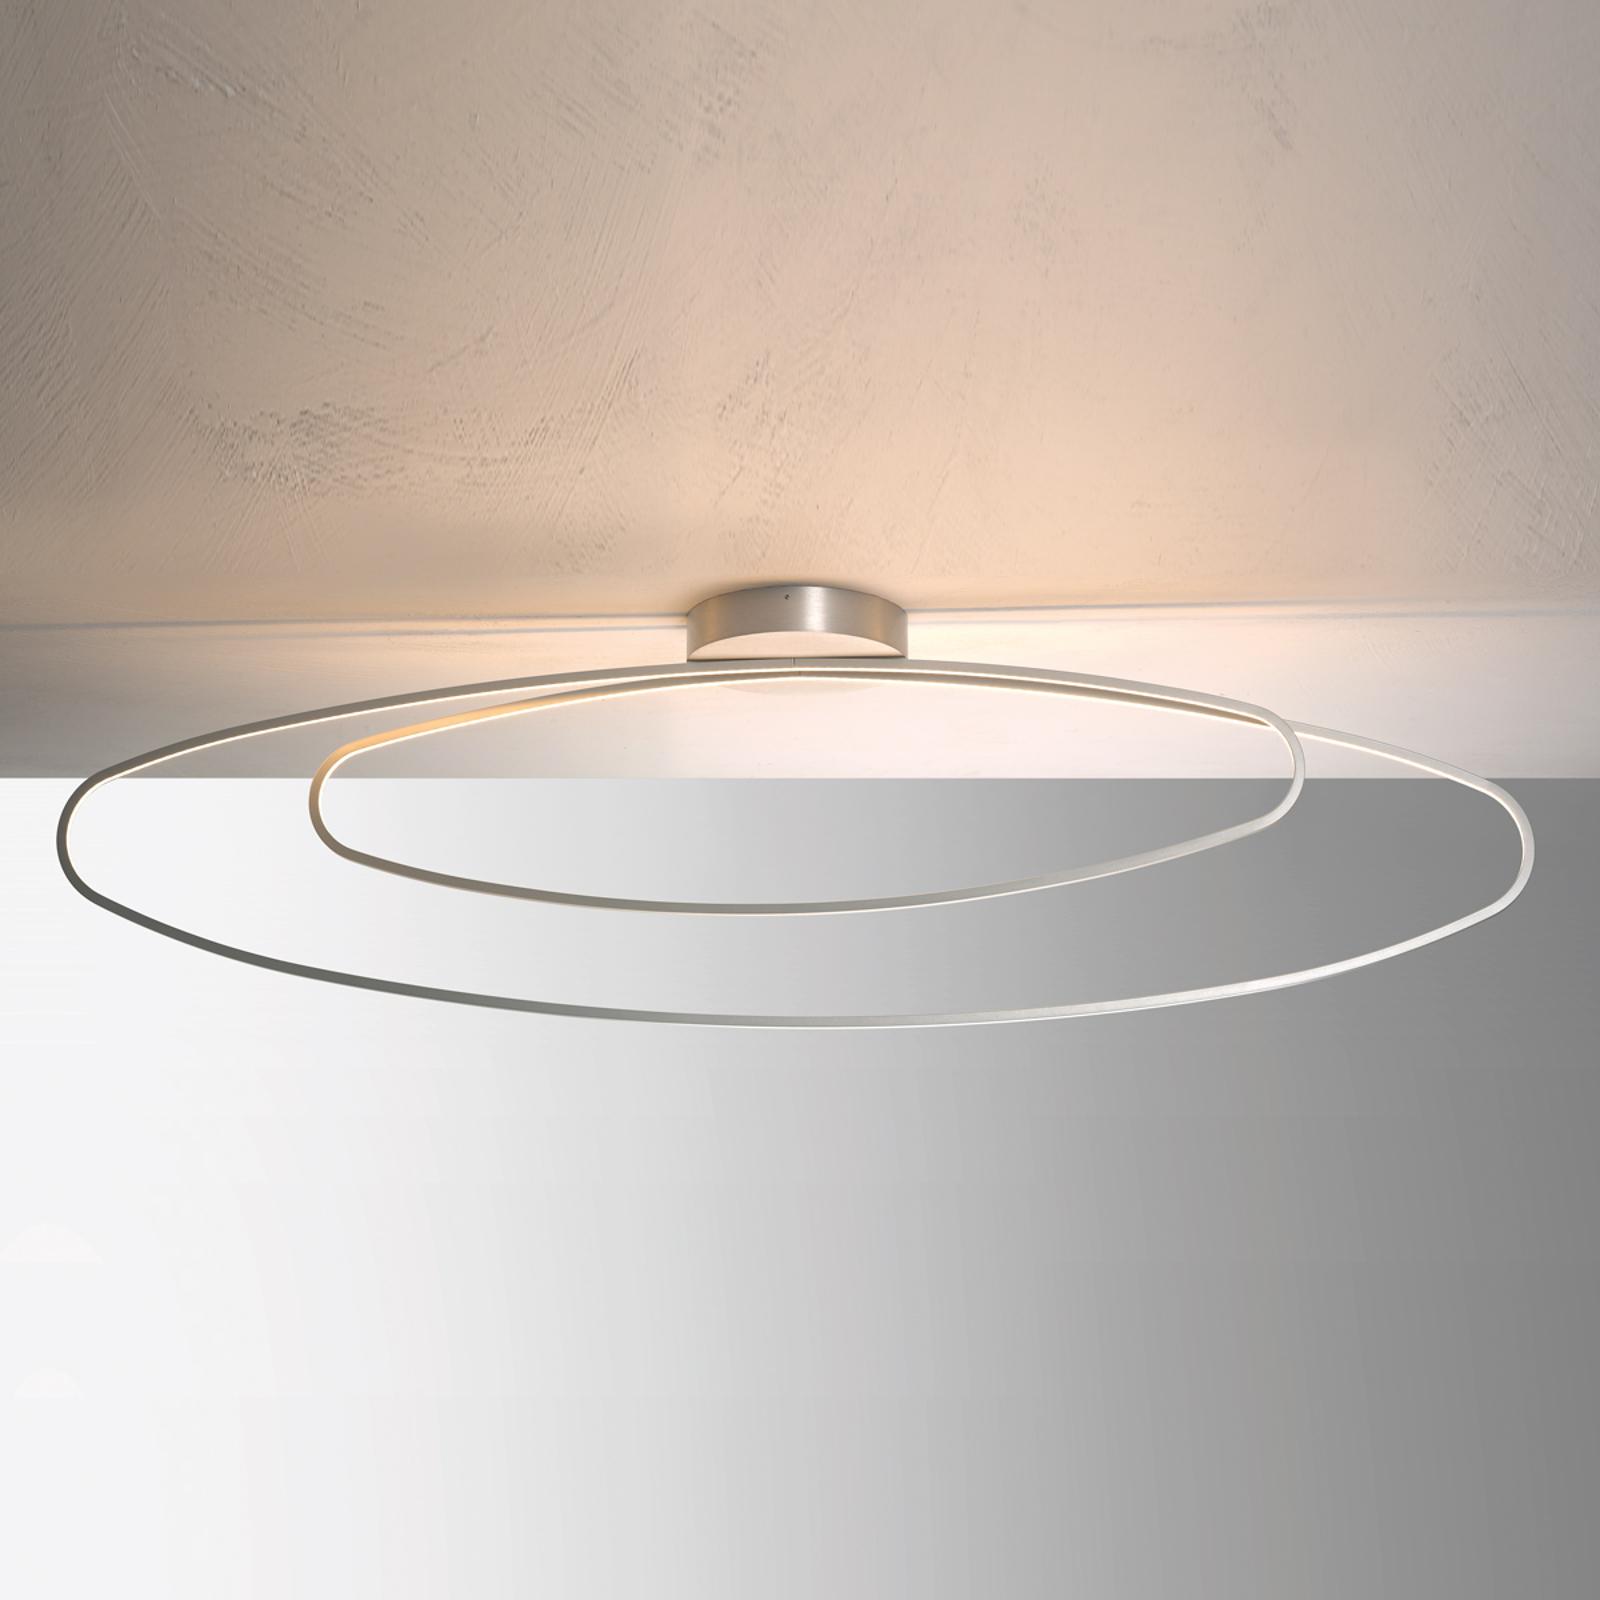 Bopp Flair - filigrane LED-Deckenlampe, alu